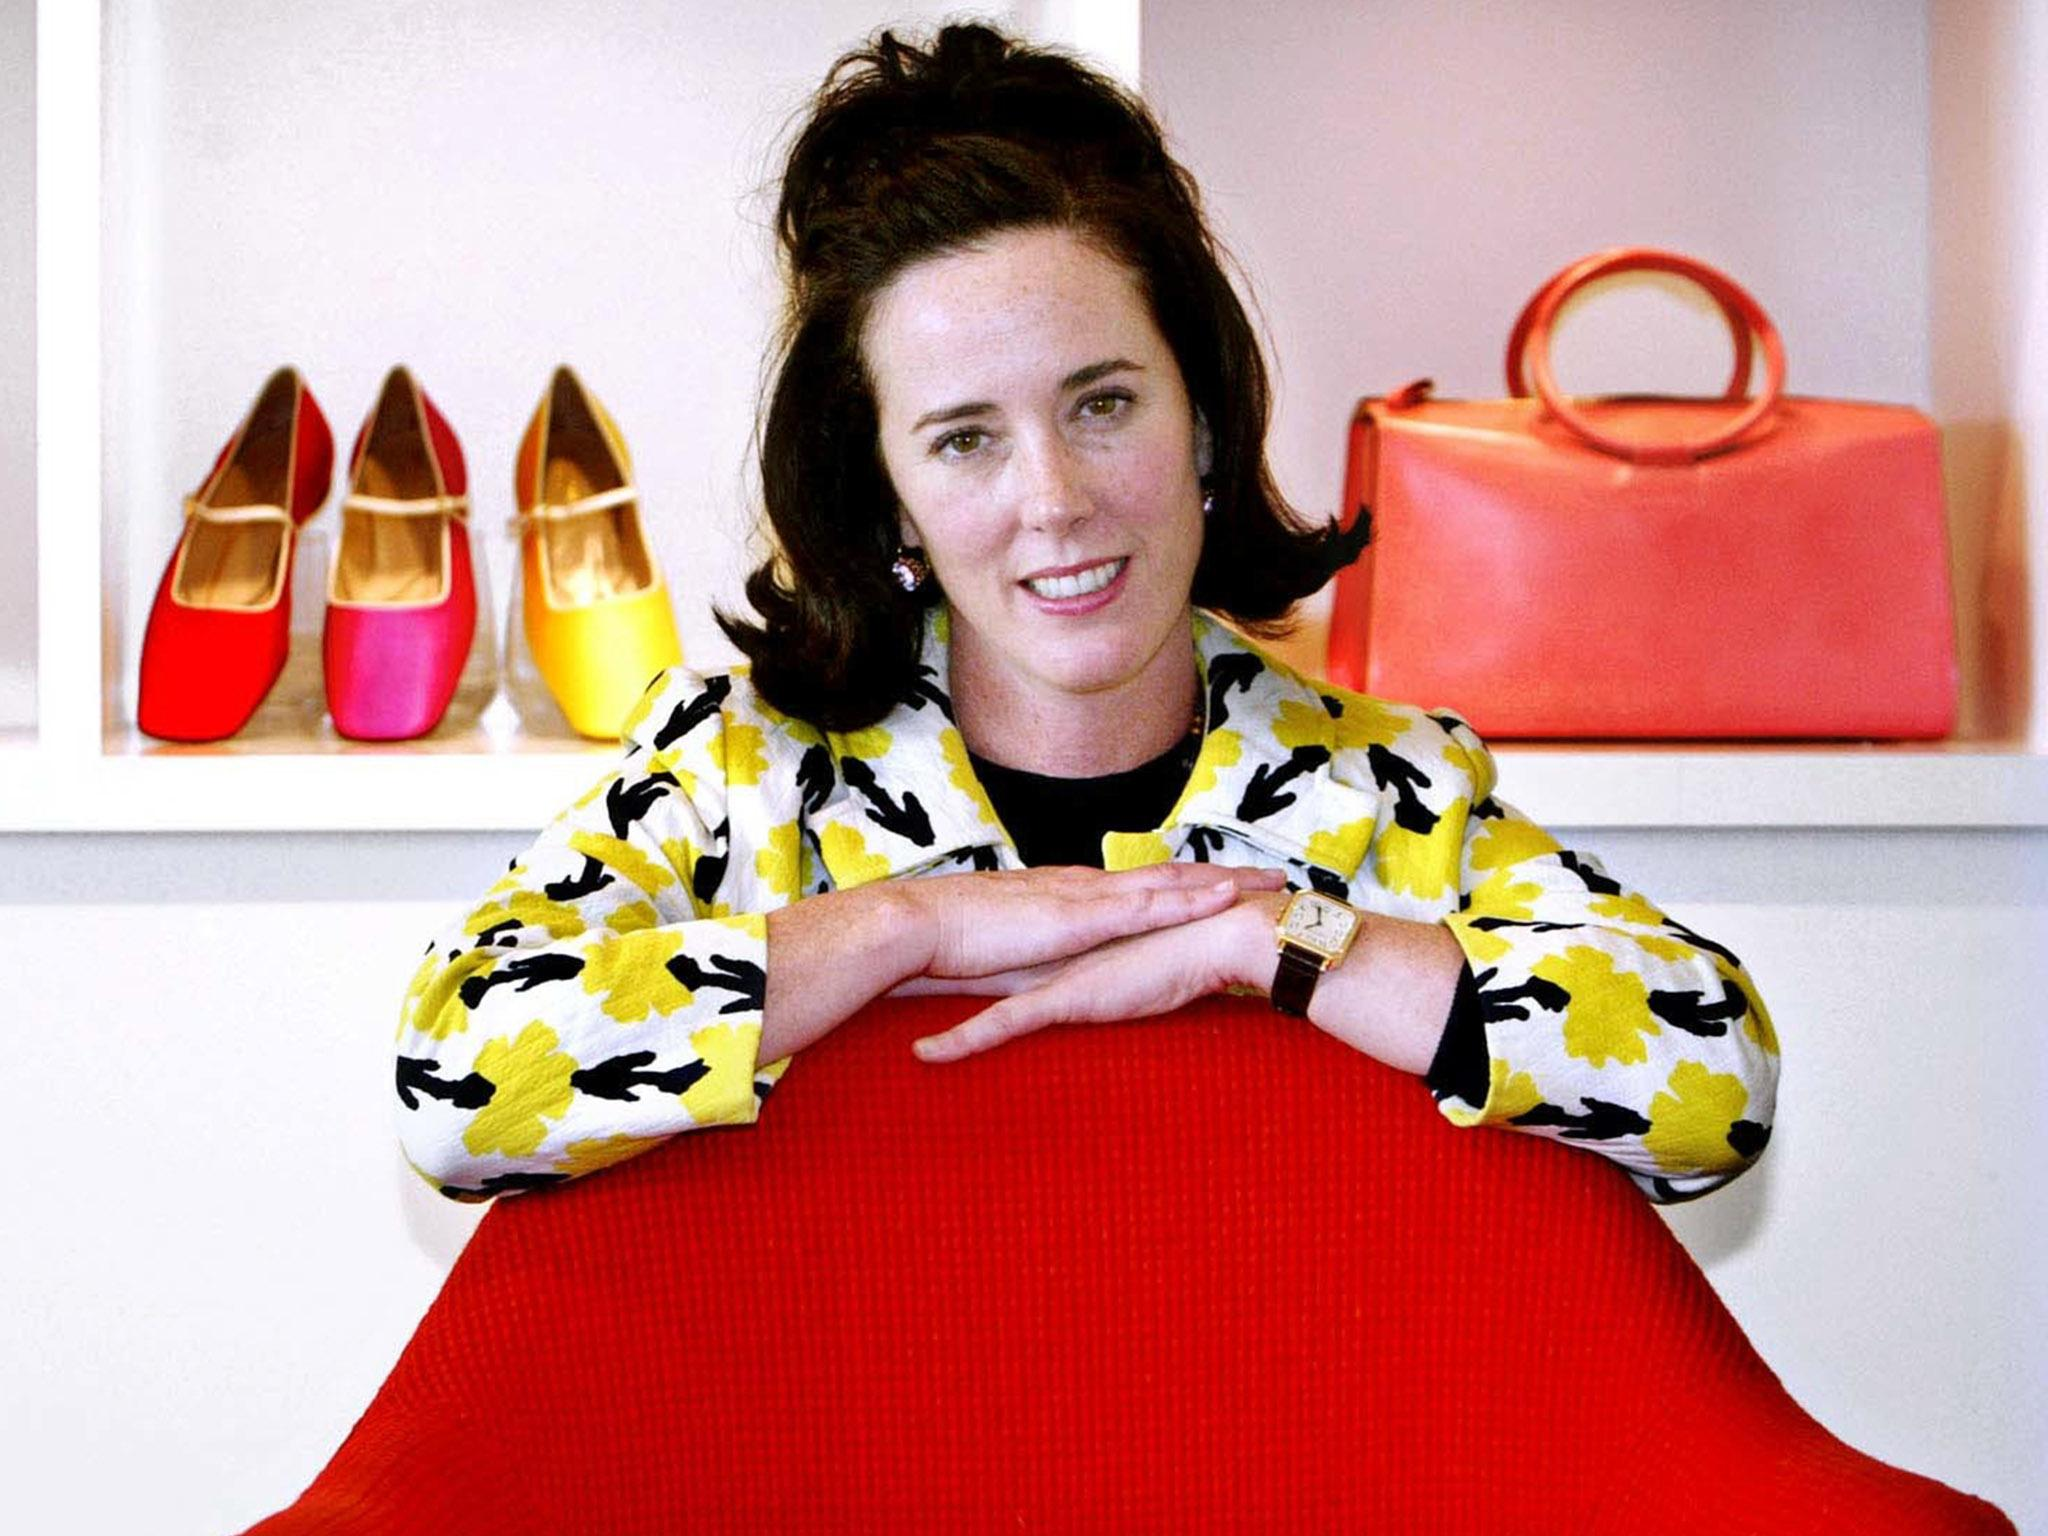 Kate Spade: Pressure of maintaining image prevented designer